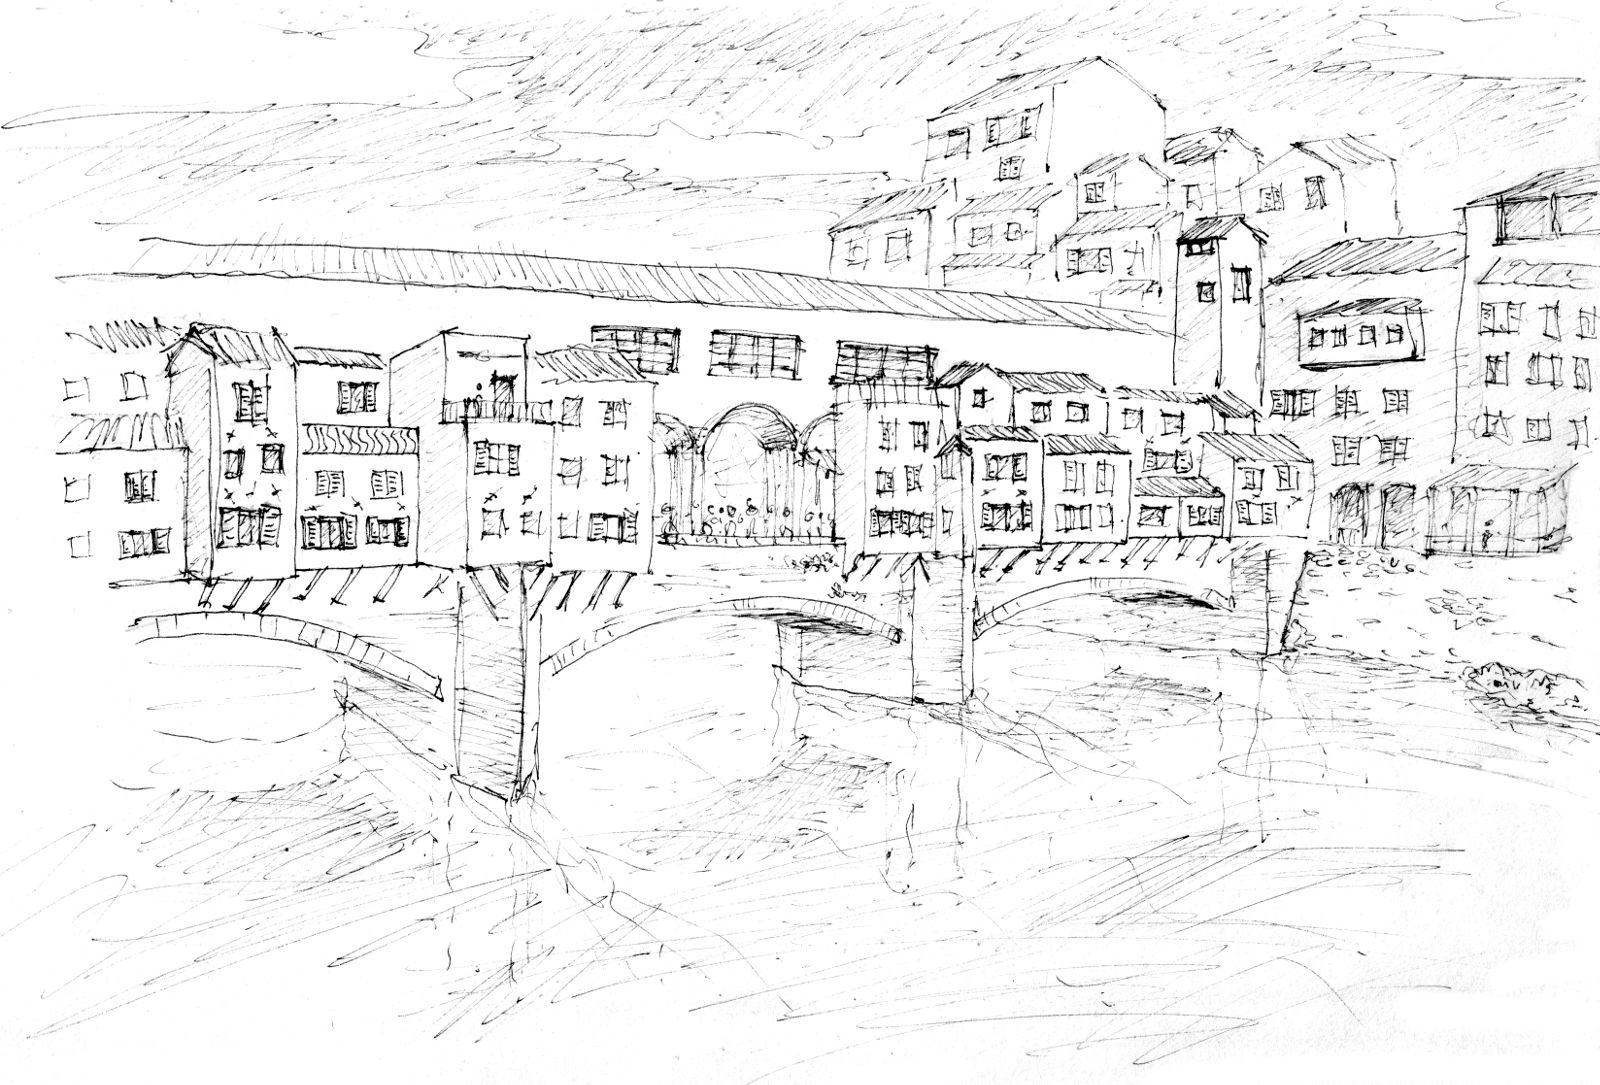 w_ponte-vecchio_2015_bw_b